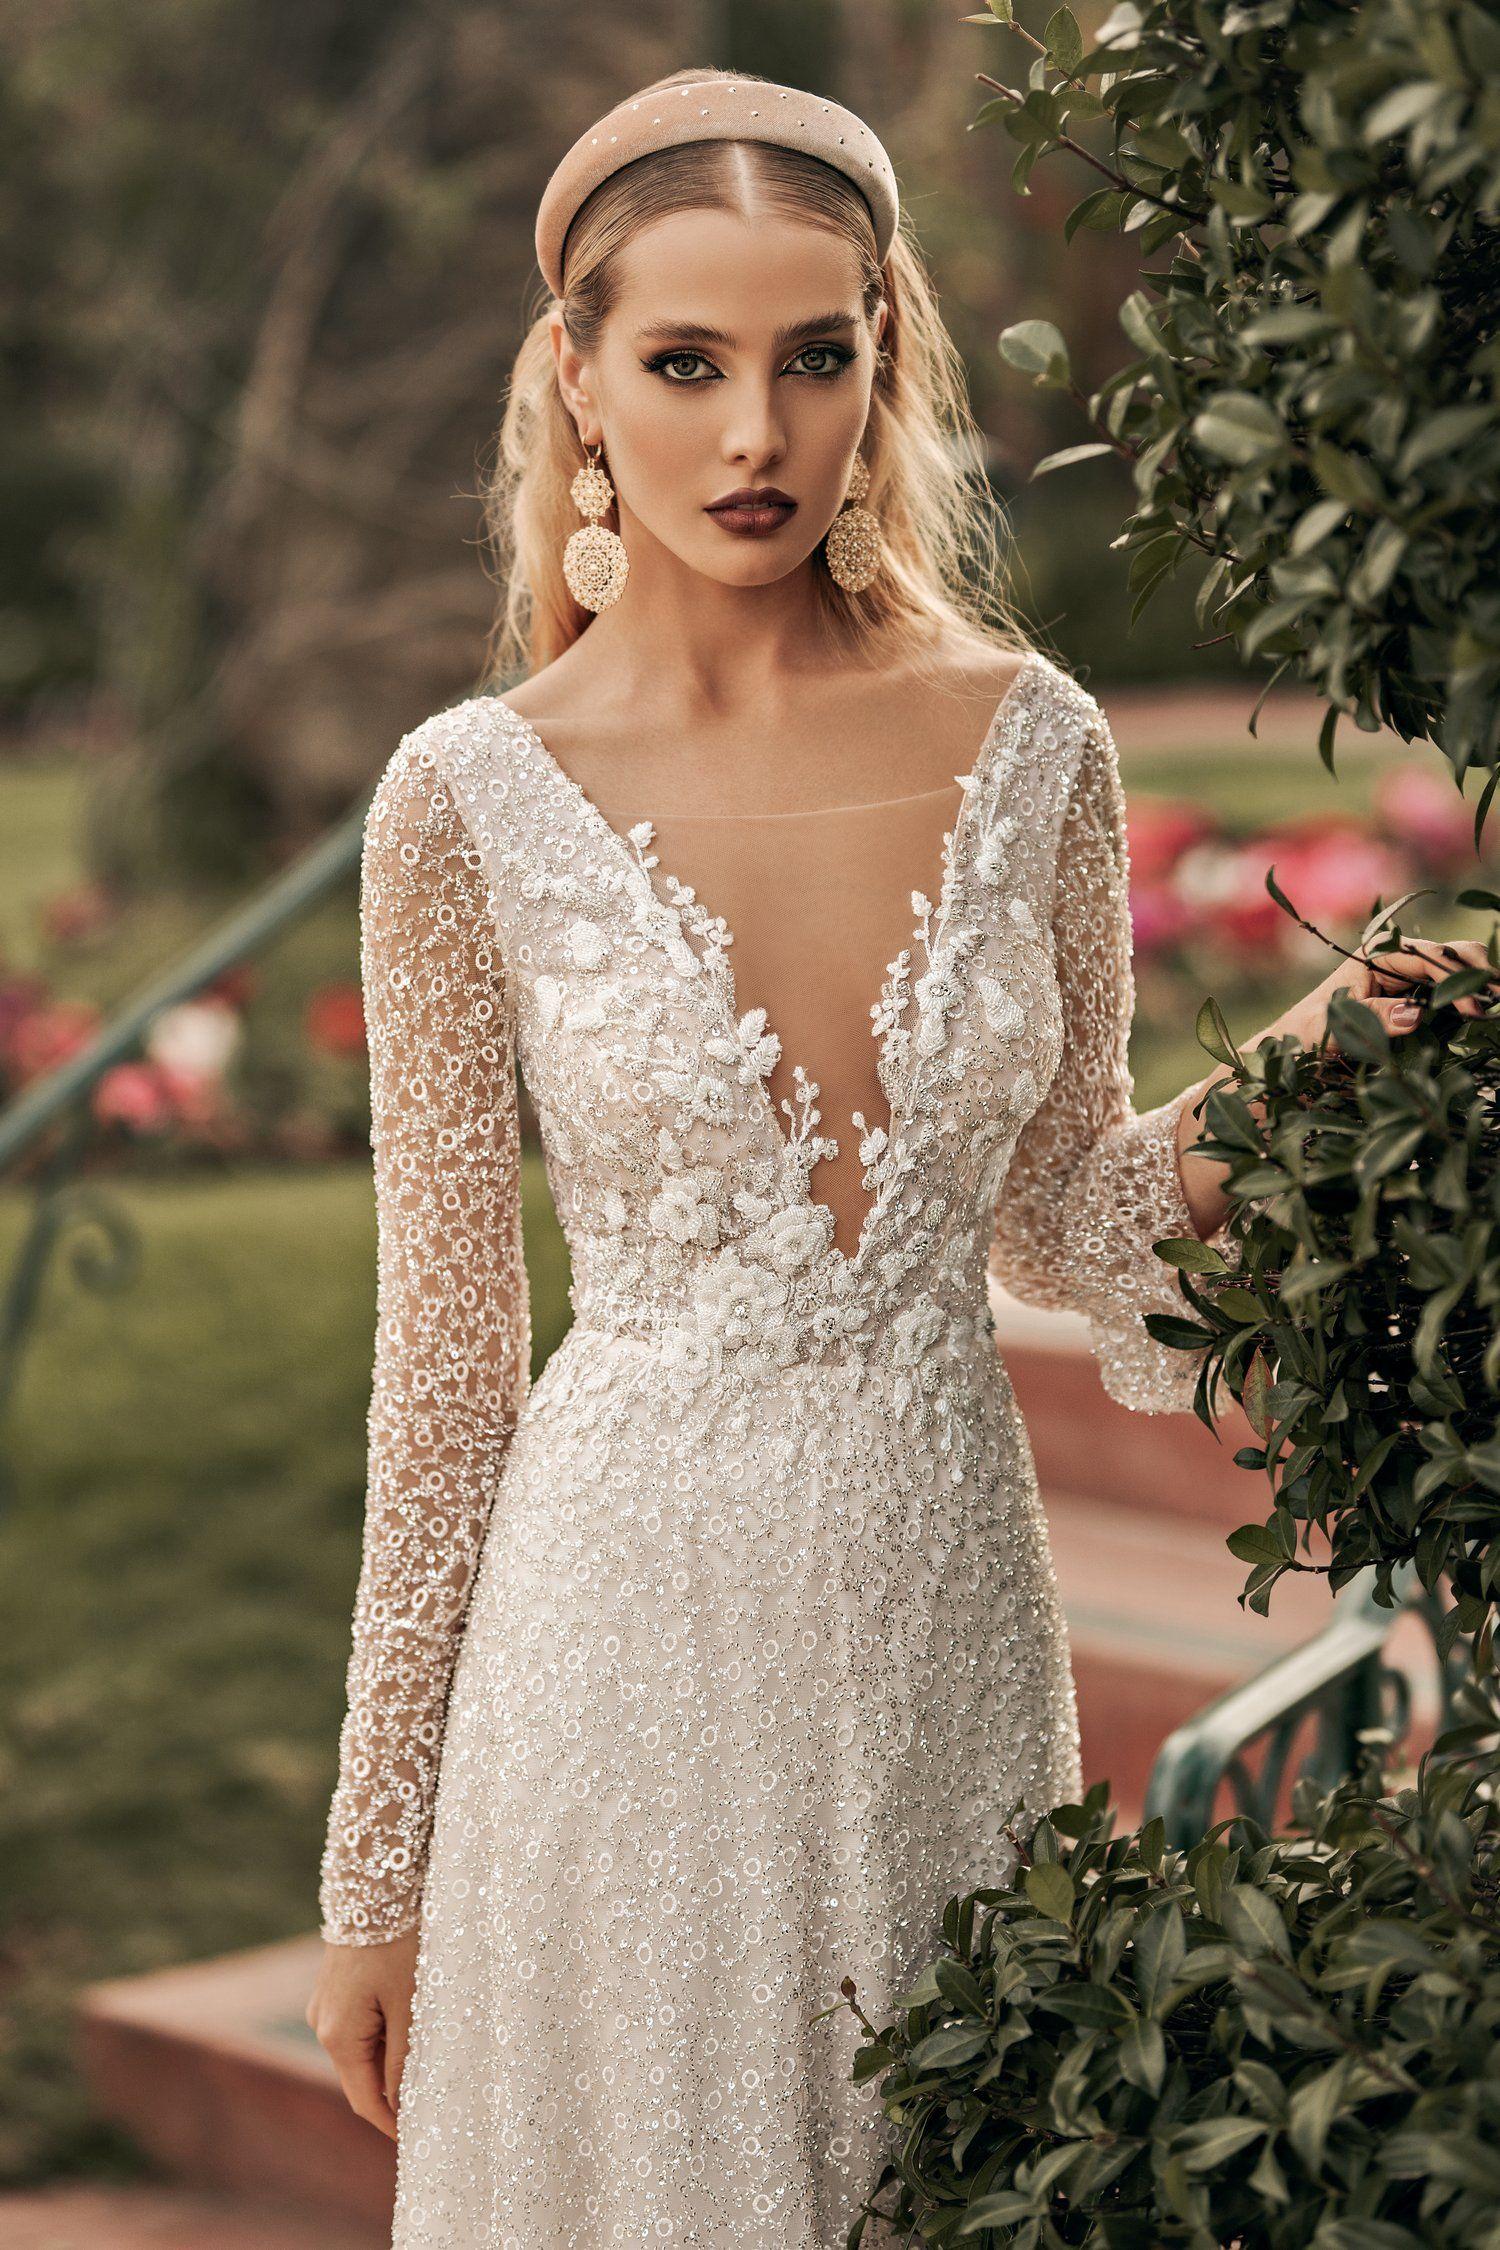 Los Angeles Wedding Dress 094 Sharon In 2020 Wedding Dresses Los Angeles Wedding Dresses Unique Wedding Gowns